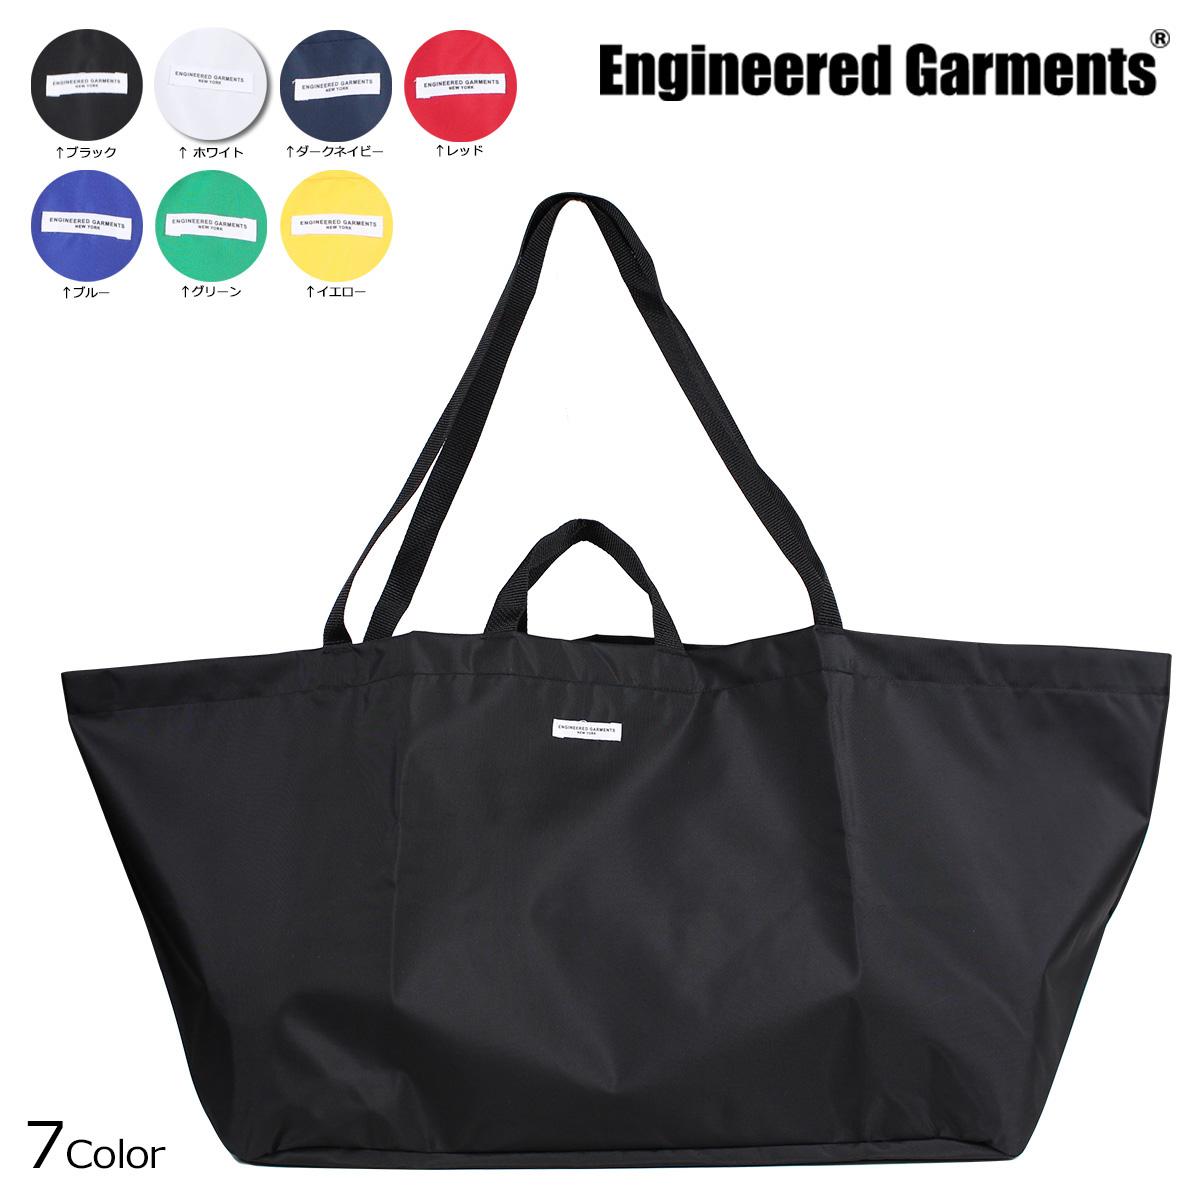 ENGINEERED GARMENTS WEEKEND BAG エンジニアドガーメンツ バッグ メンズ レディース トートバッグ ショルダー [184]